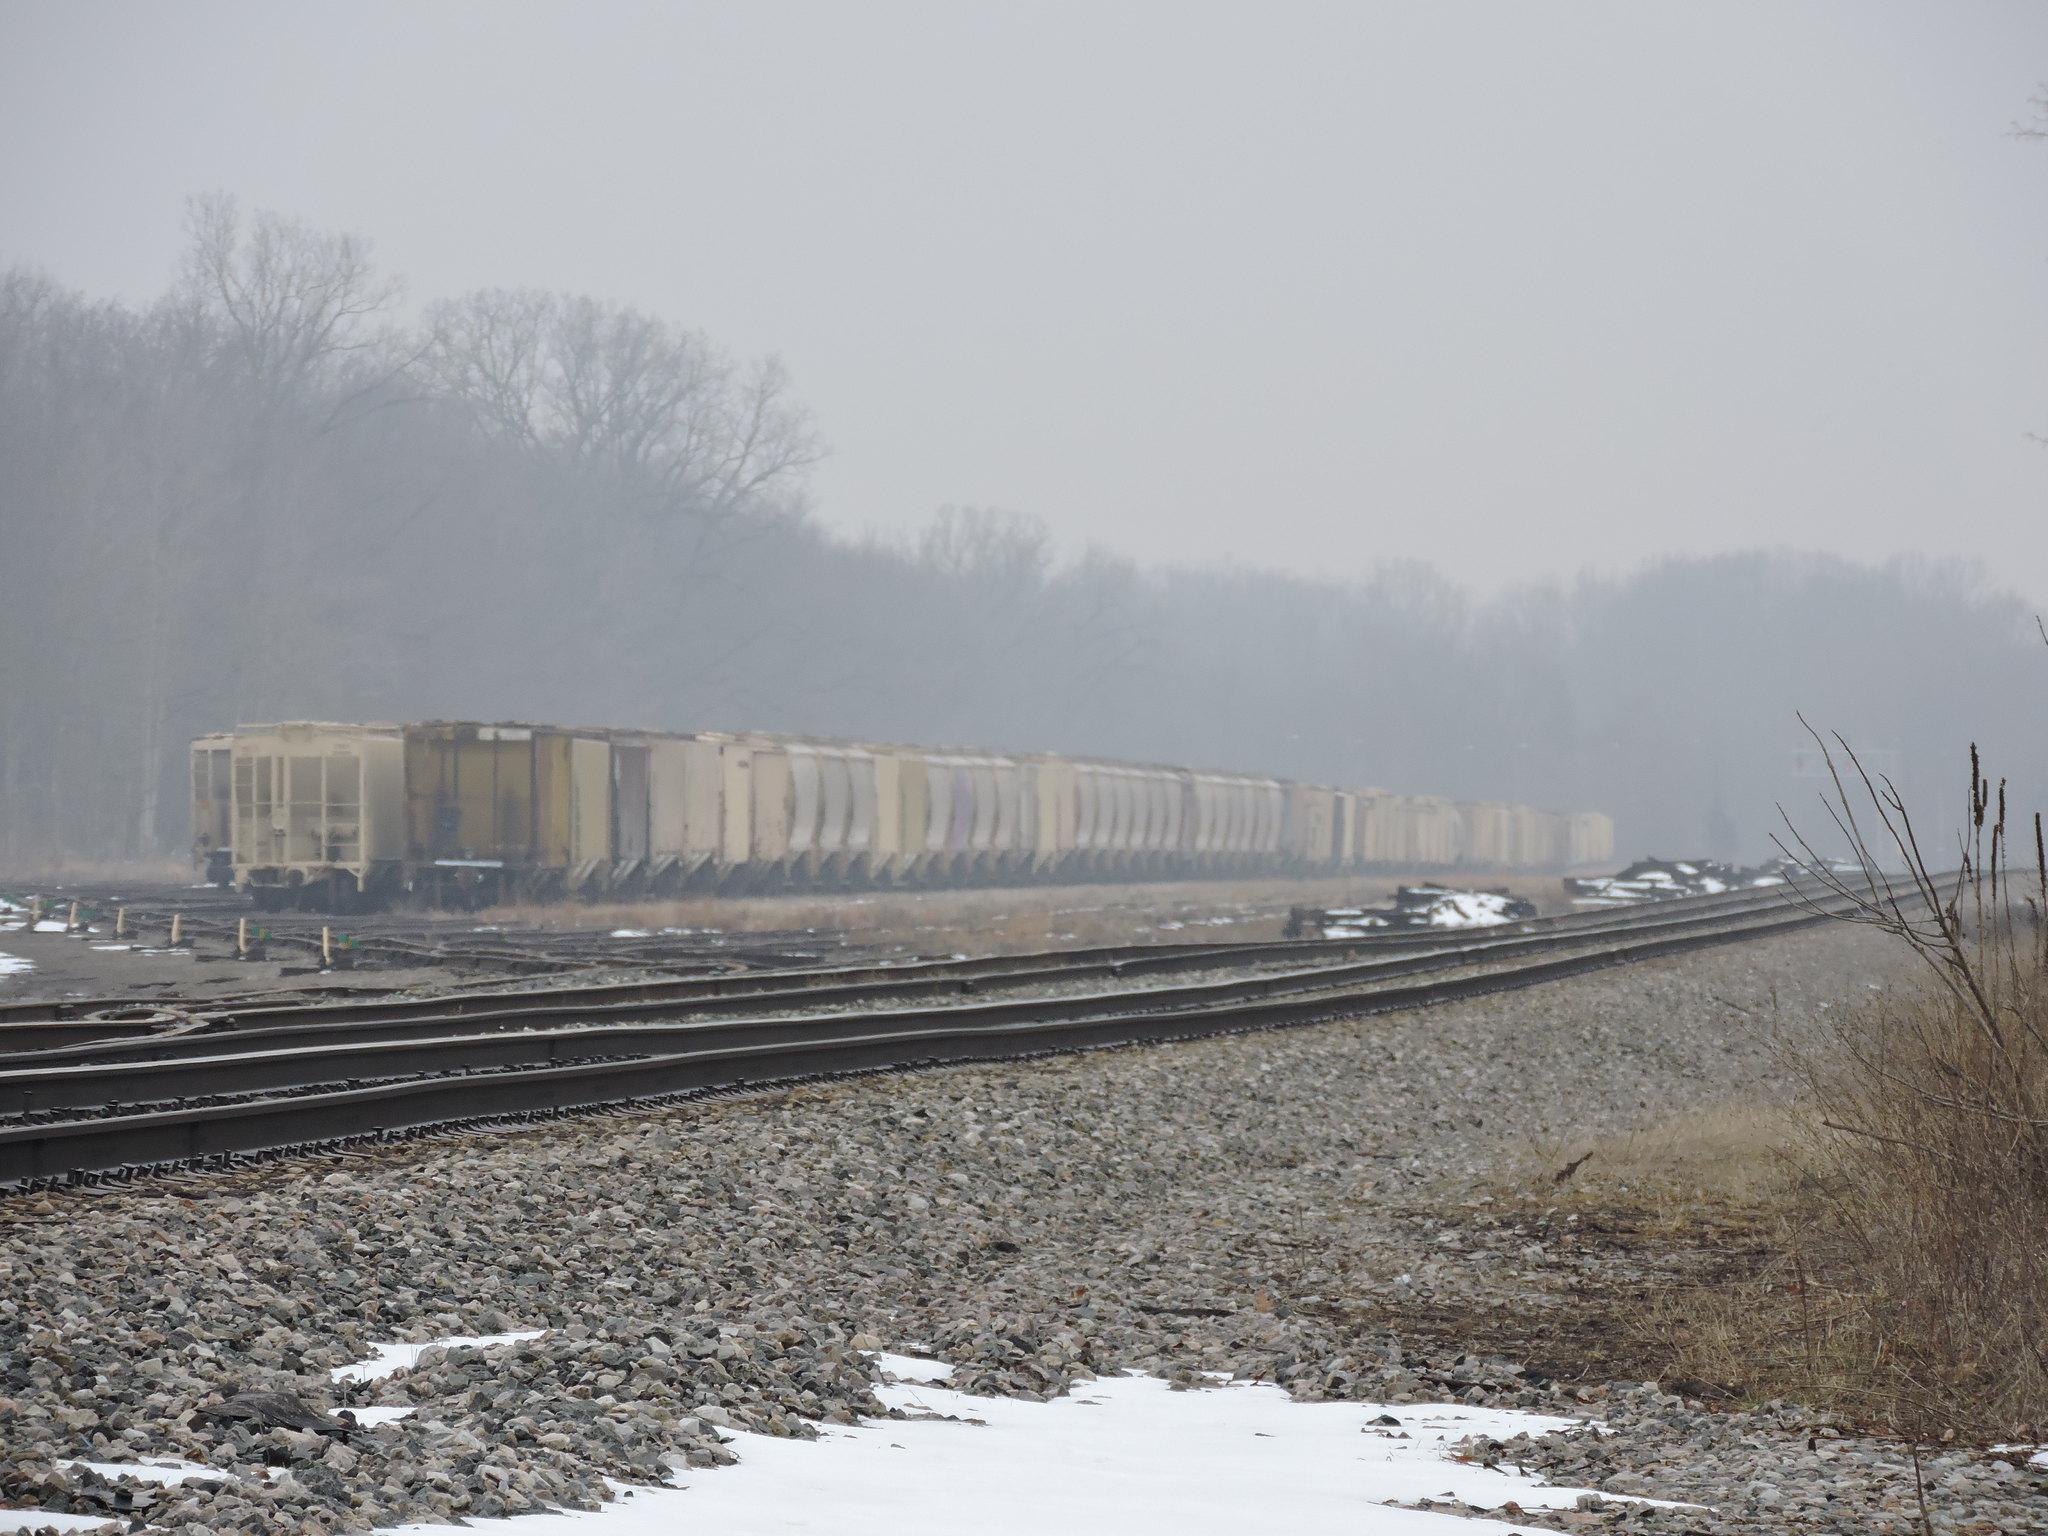 Railroadfan com • View topic - CSX Line E-W across Michigan